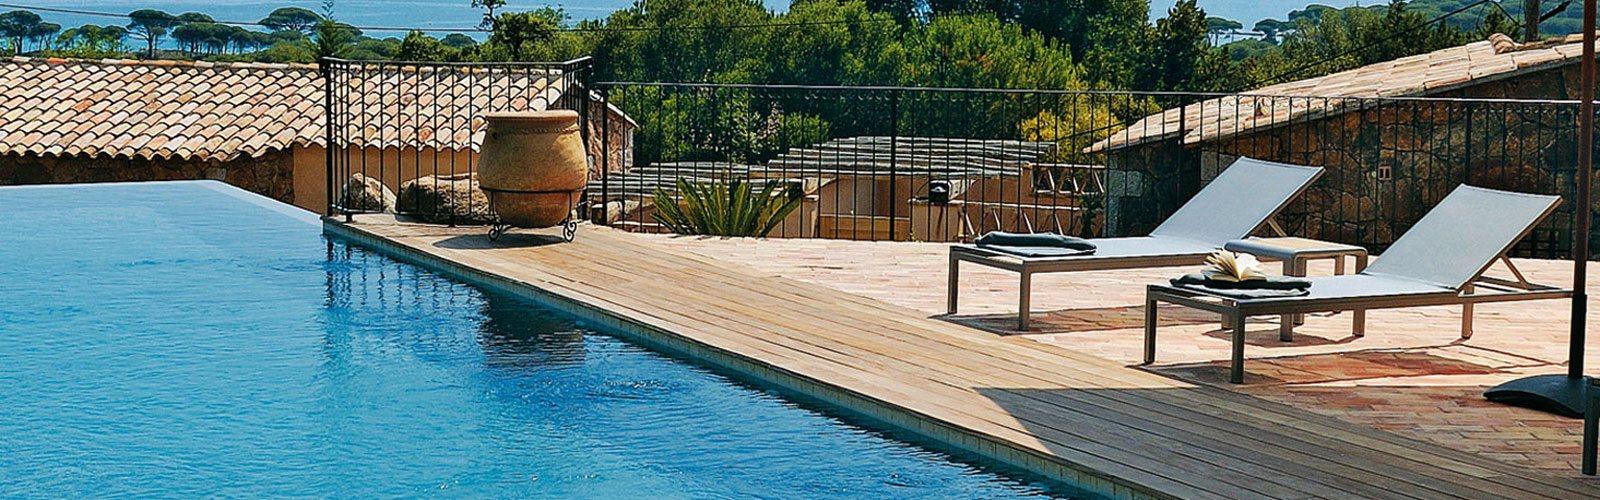 Hotel Korsika Pool mit Liegen